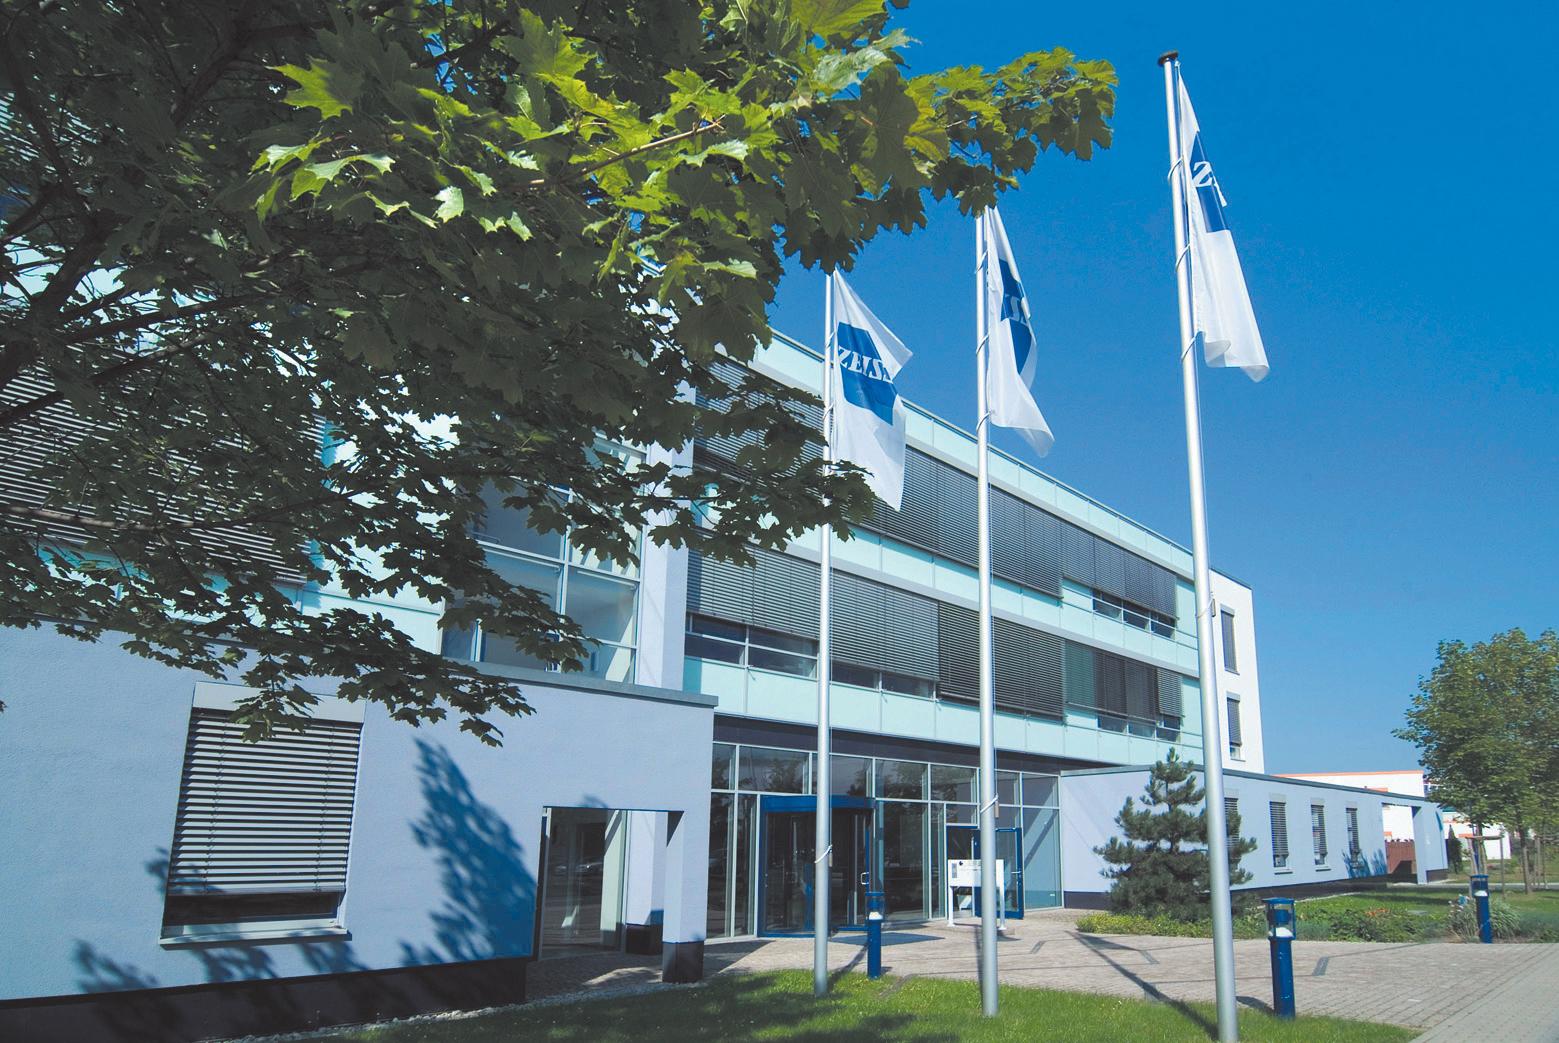 Quarterly Report of Carl Zeiss Meditec AG - Medical